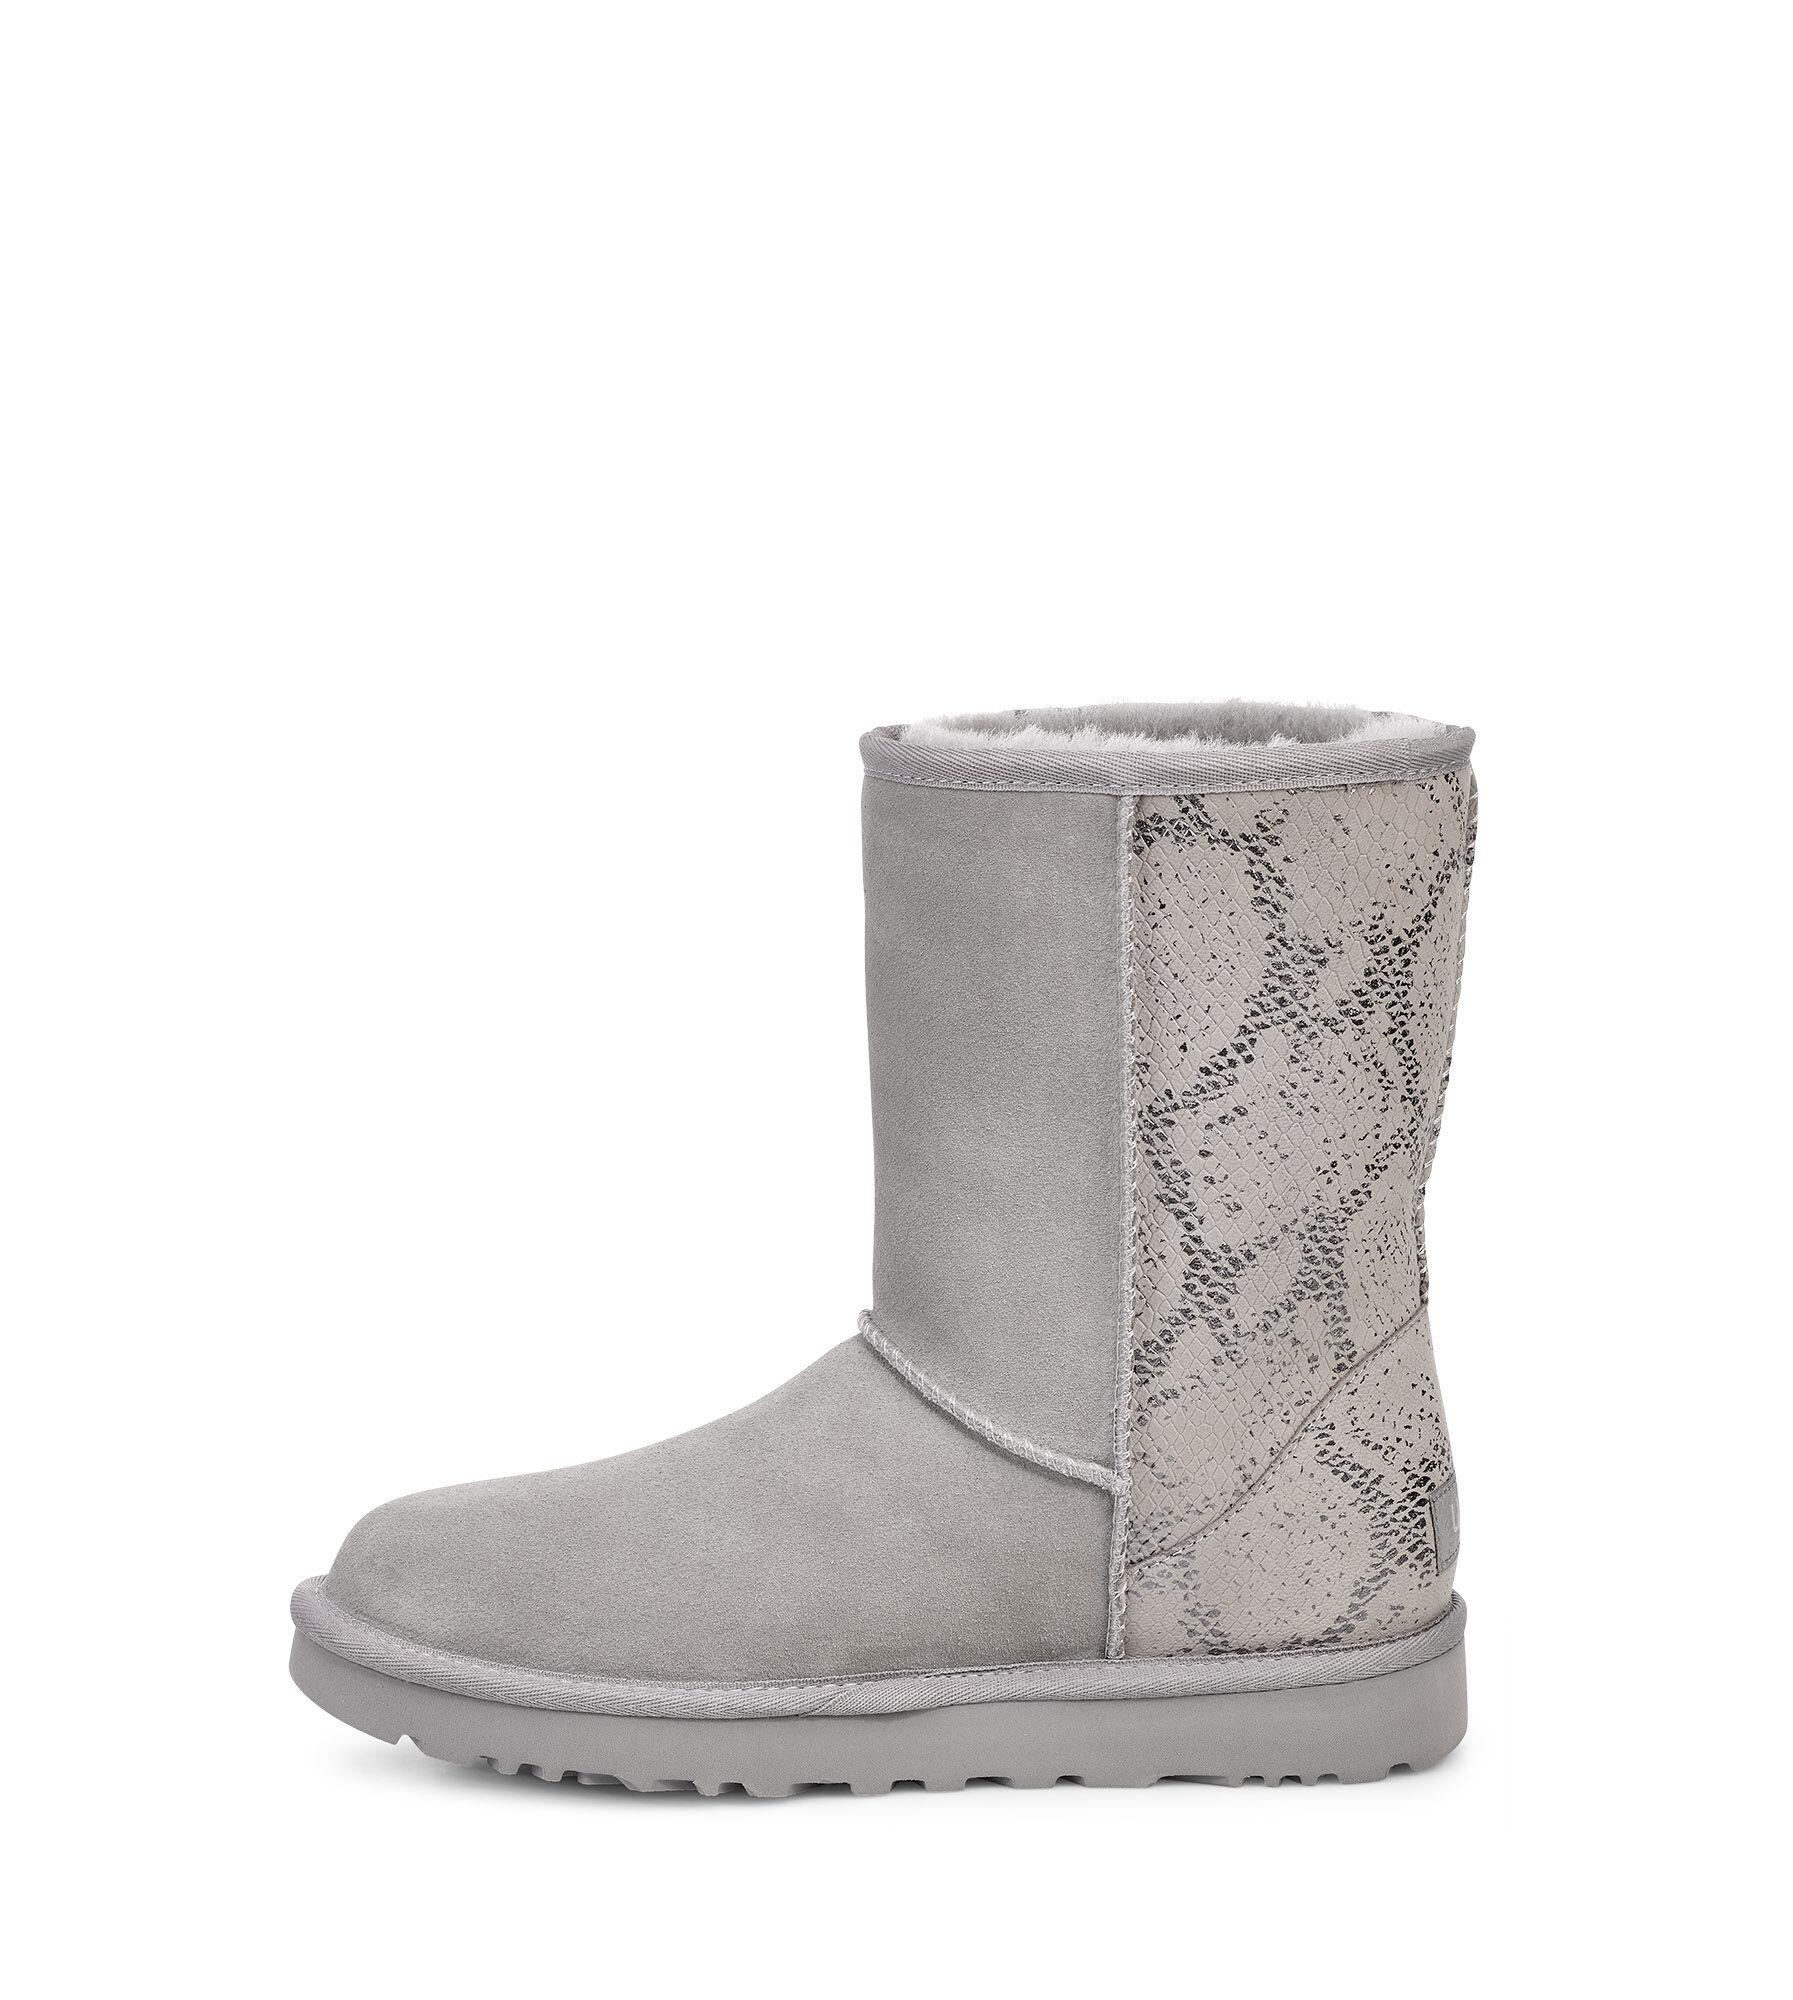 DamenDe Metallic Für Short Stiefel Snake Ugg® Classic f6g7Yby